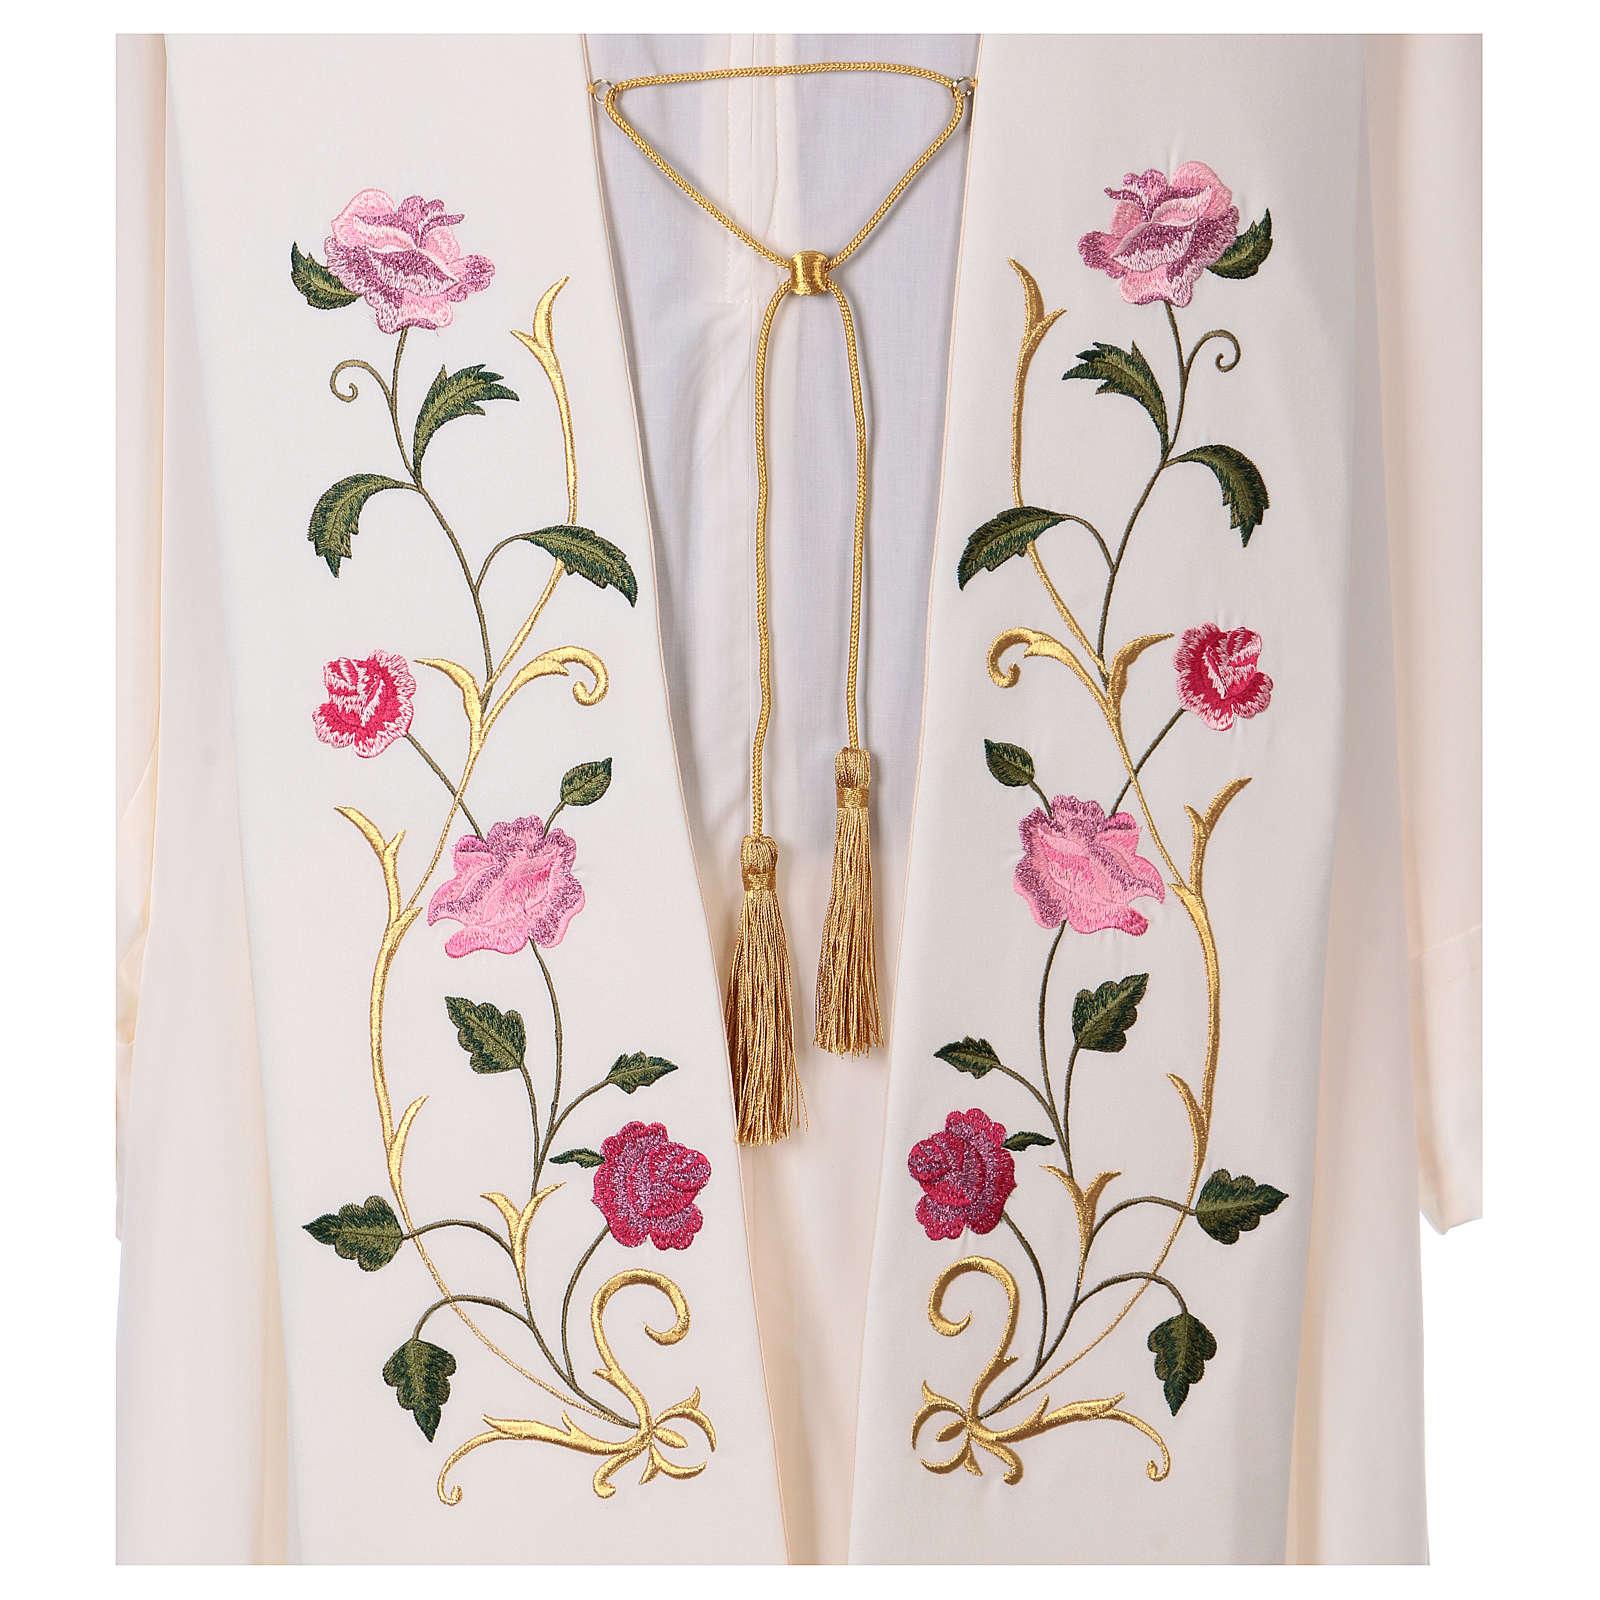 Stola tela poliestere rose e foglie 4